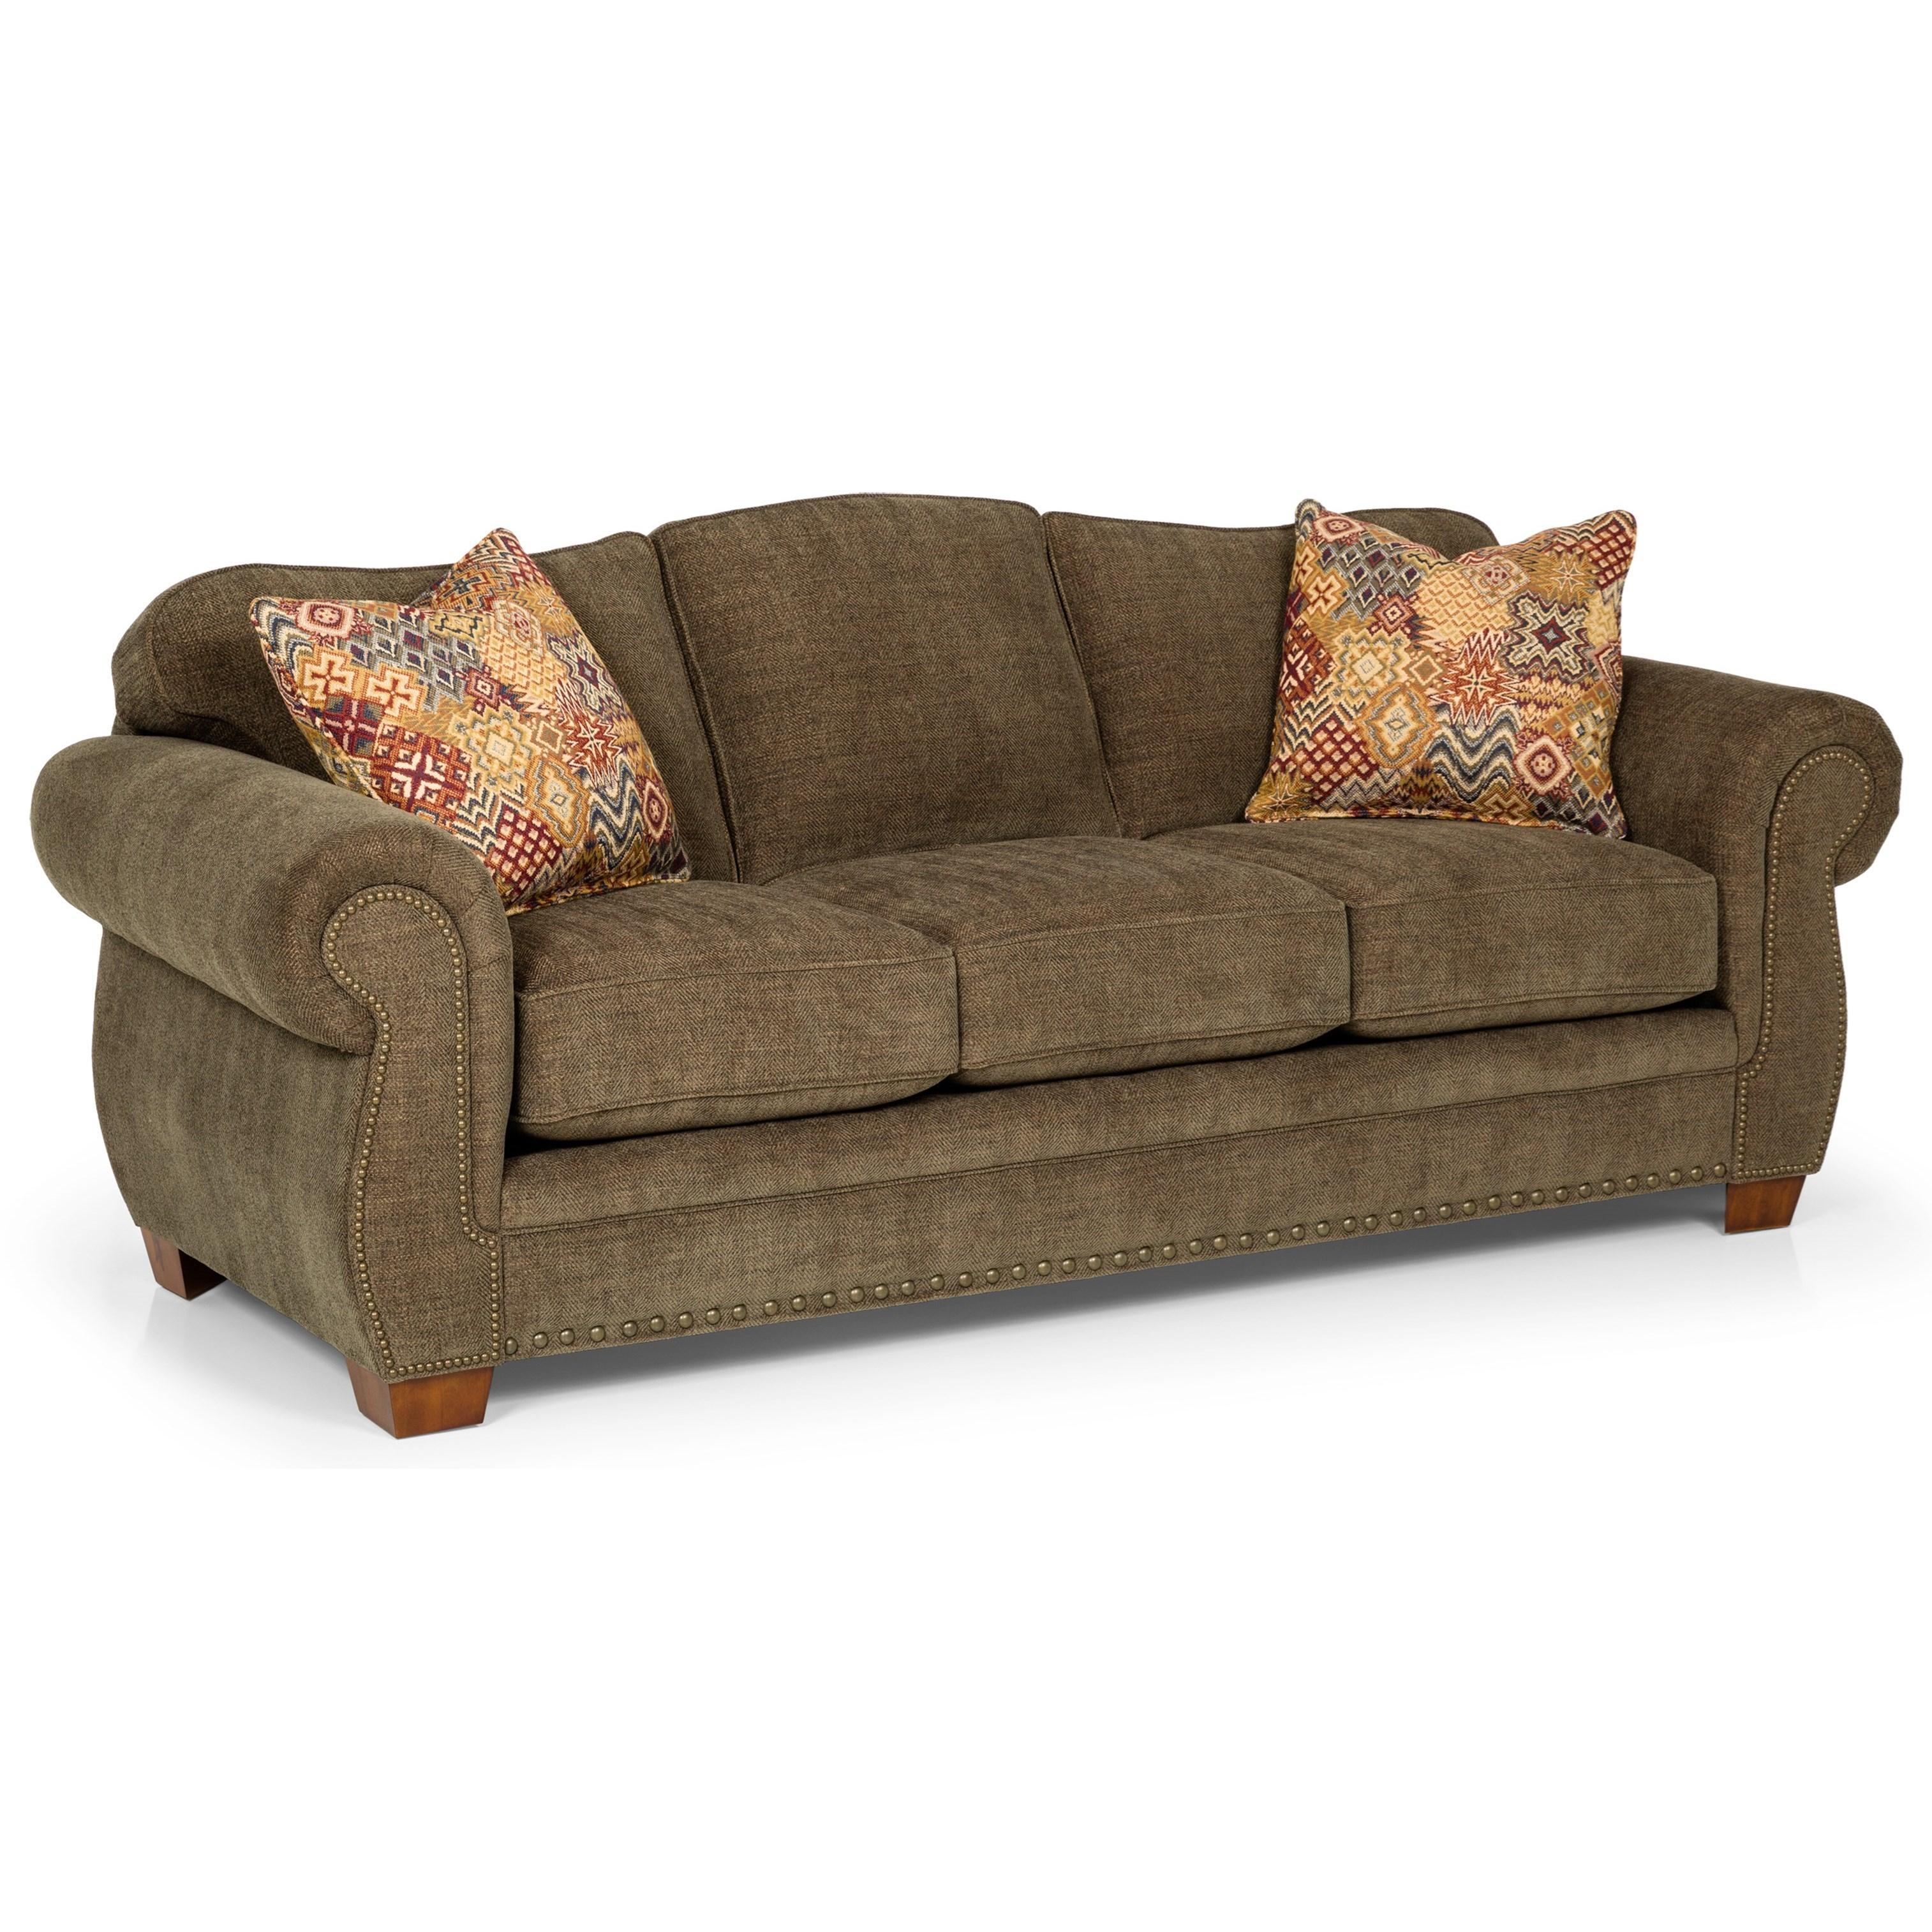 Stanton 273 Queen Basic Sleeper Sofa - Item Number: 273-15B